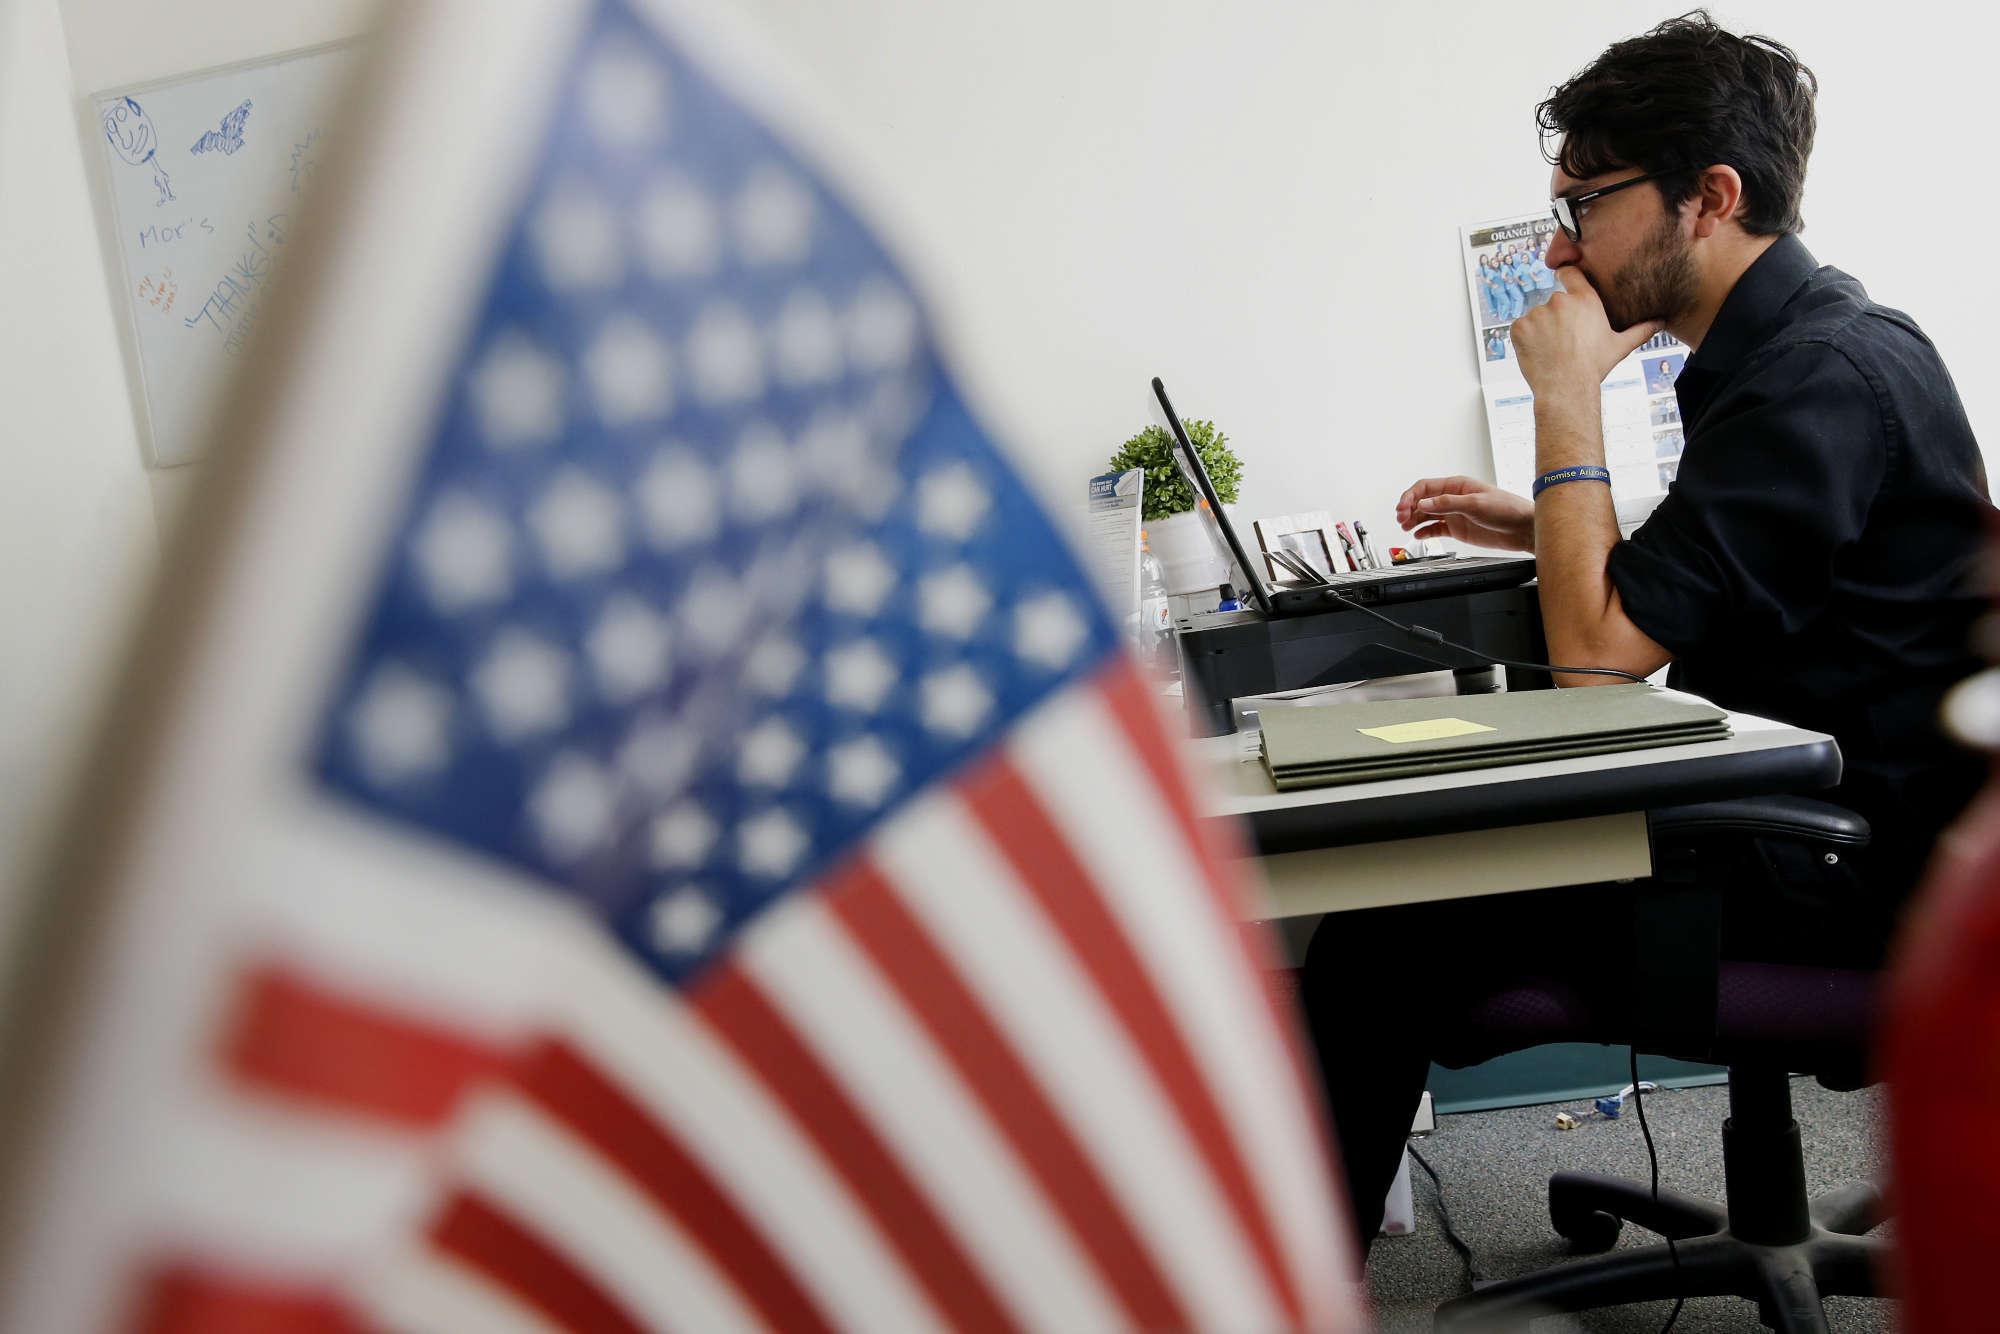 Дух указа - давать работу не иностранцам, а американцам. Фото Bloomberg.com